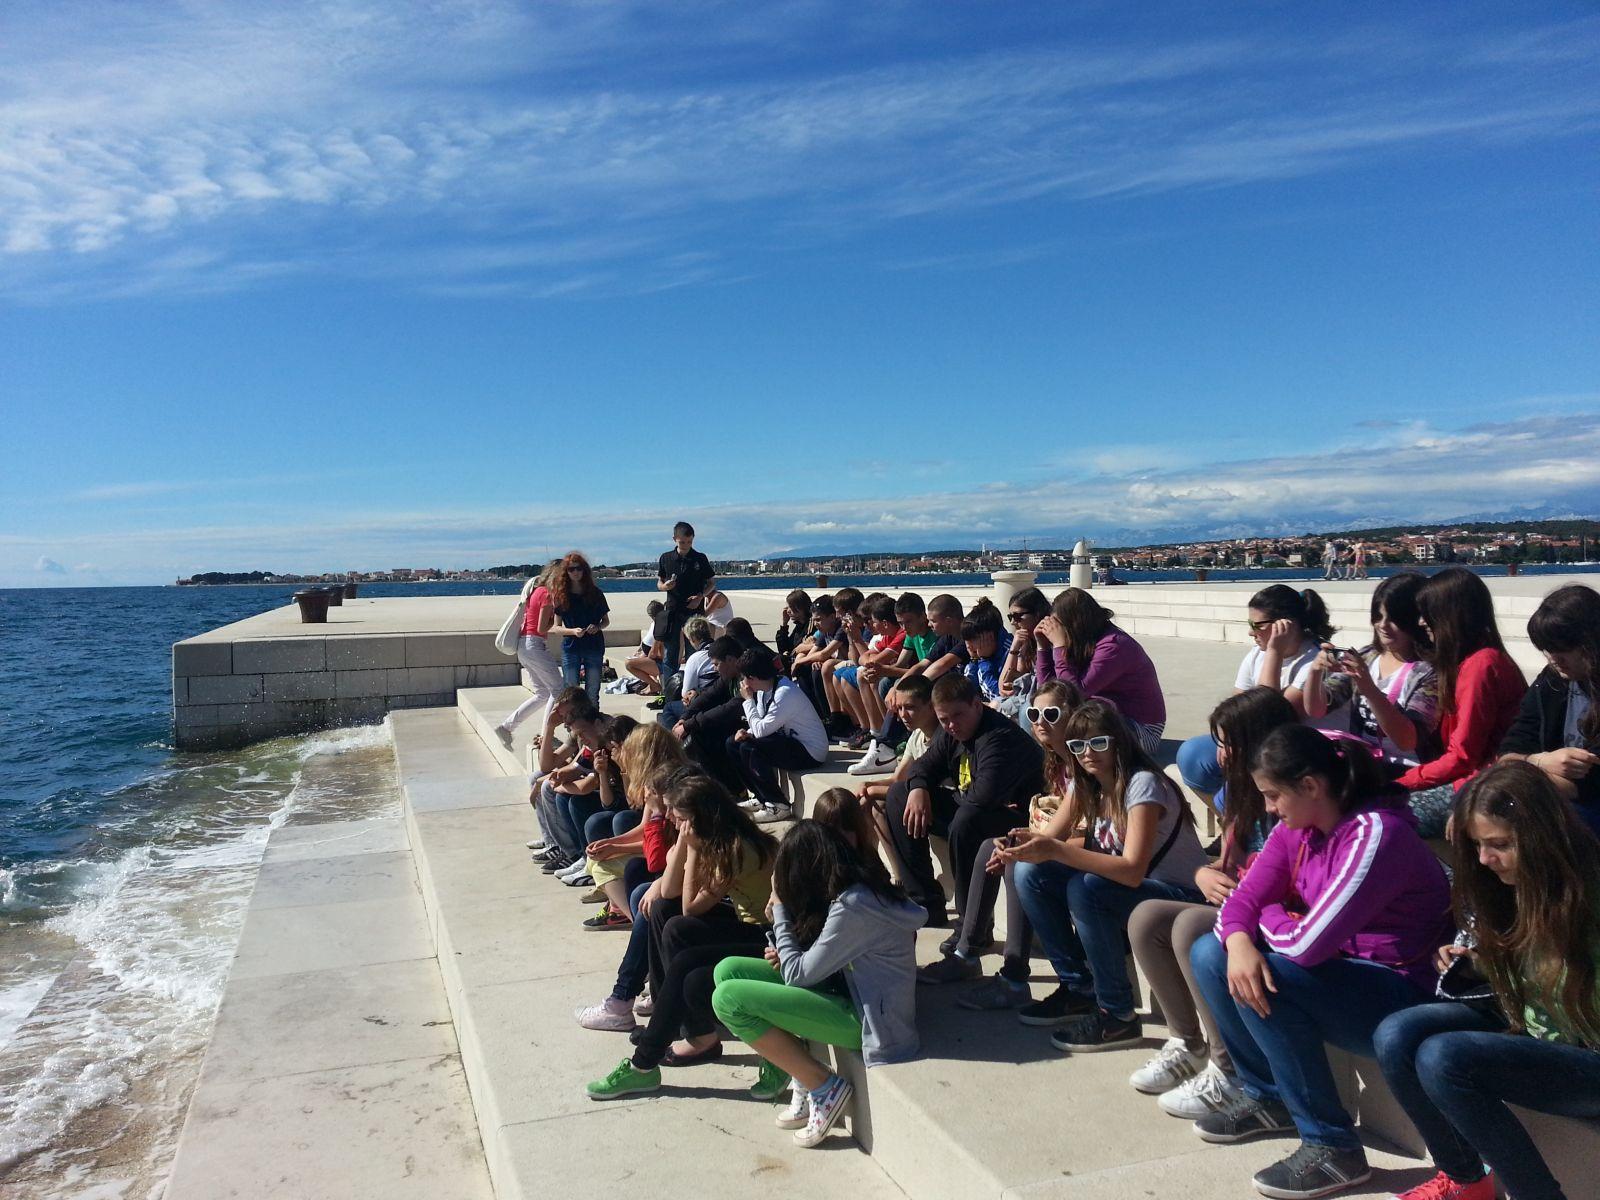 Ljepote sjeverne Dalmacije: Zadar: Morske orgulje